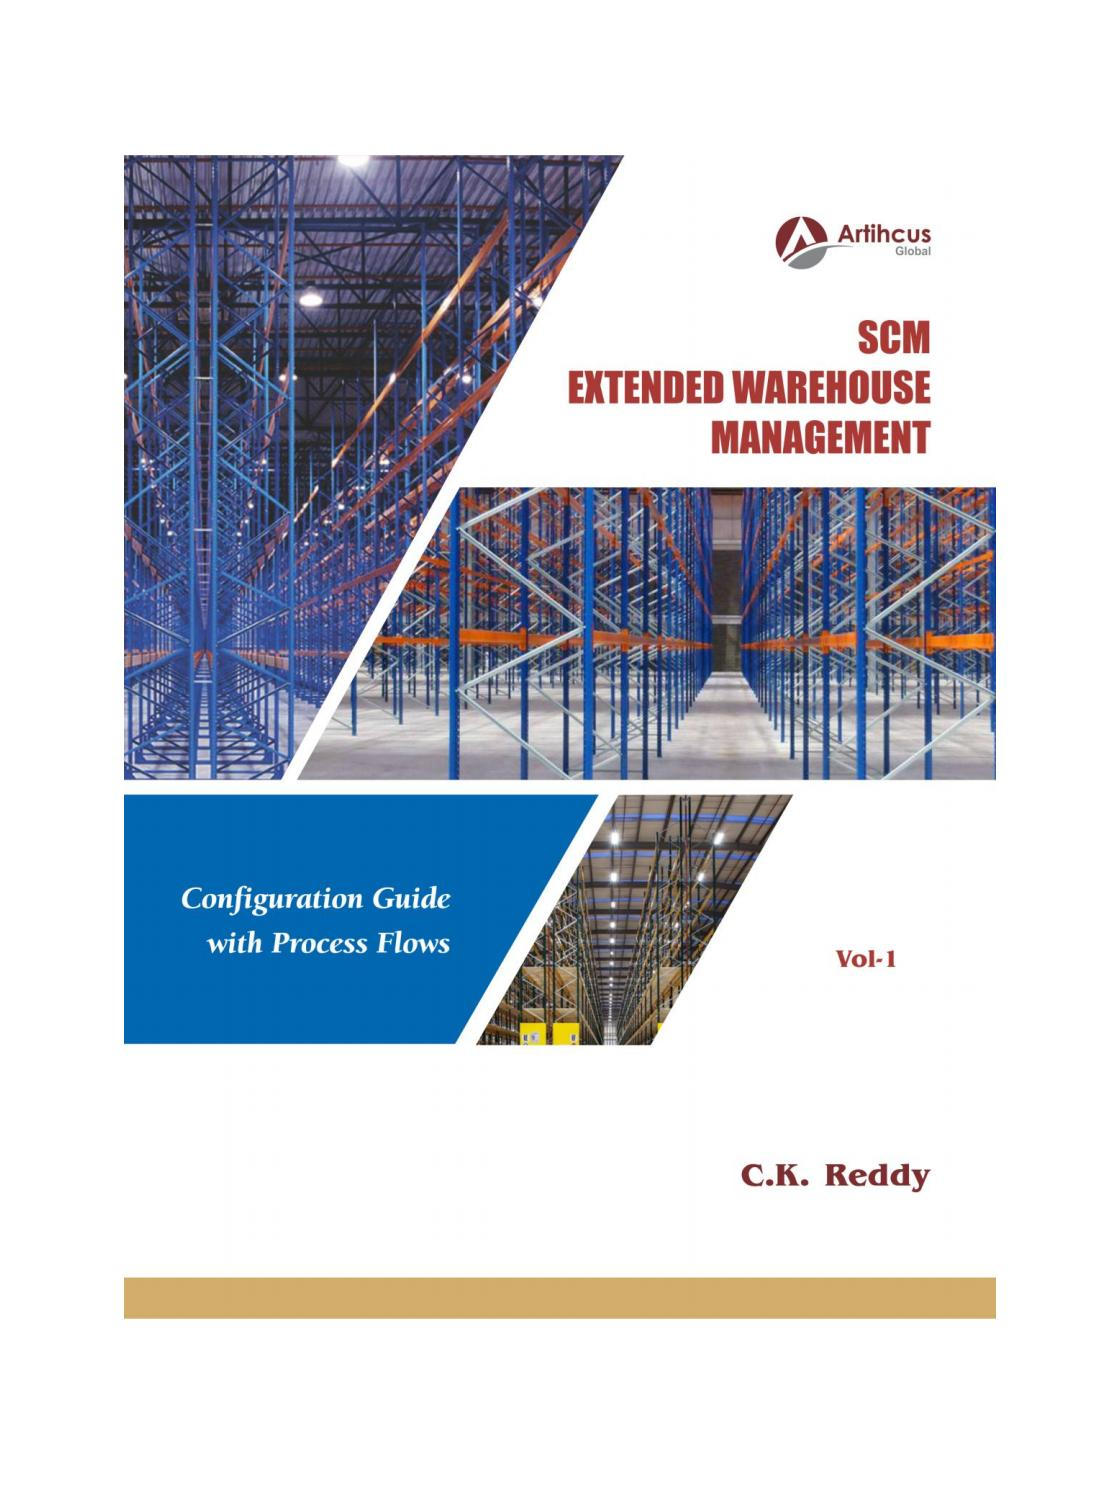 SAP EWM configuration guide with process flows by ckreddy